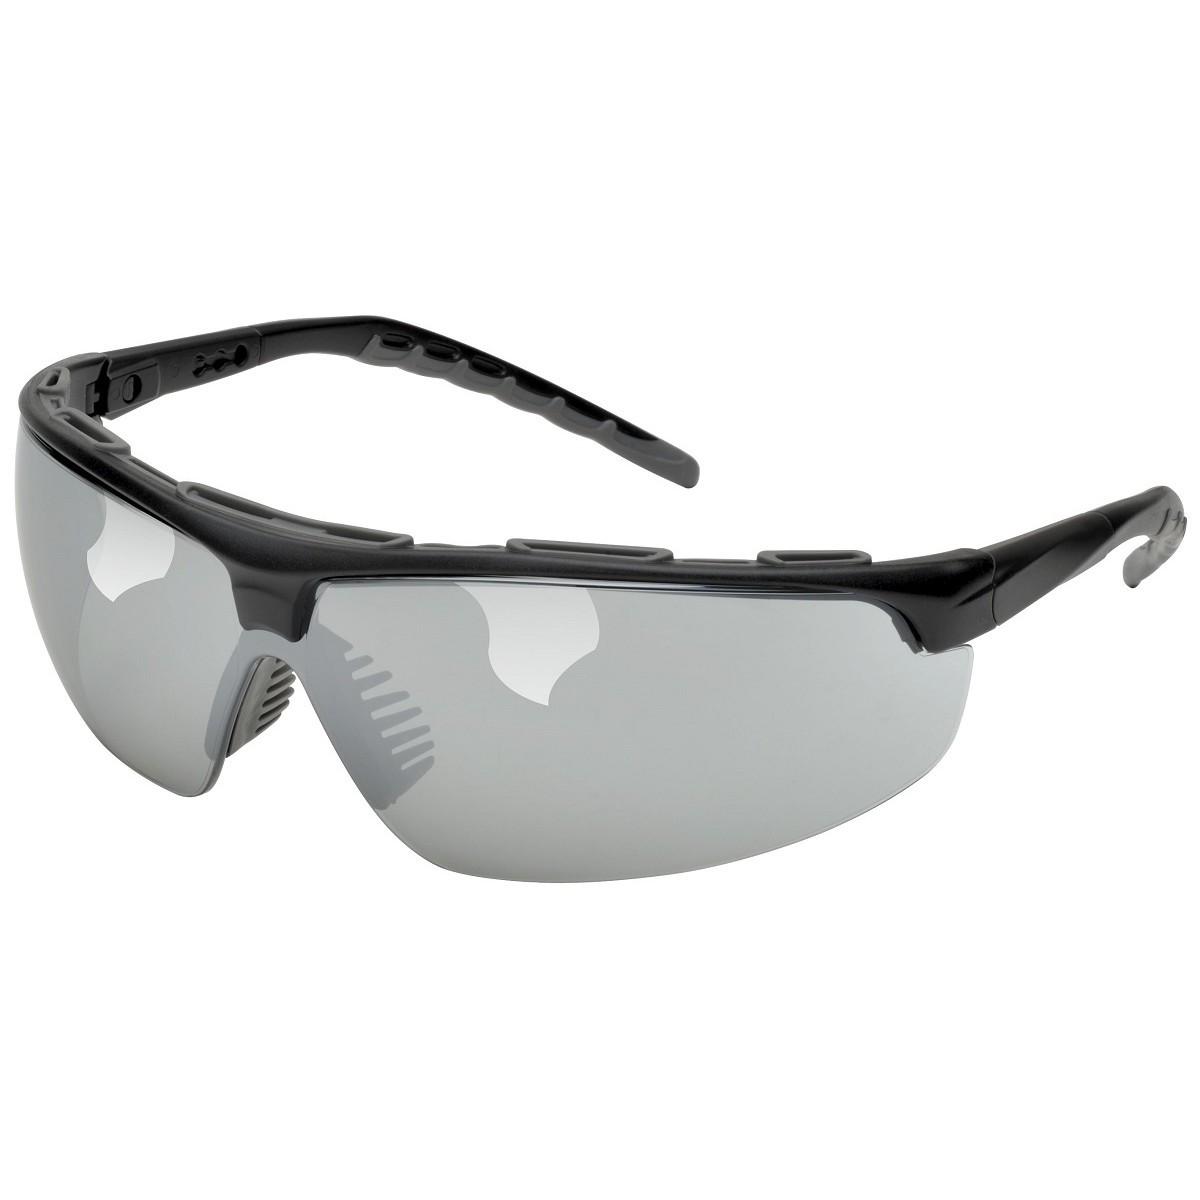 Black Frame Glasses Singapore : Elvex SG-56M Denali Safety Glasses - Black Frame - Silver ...